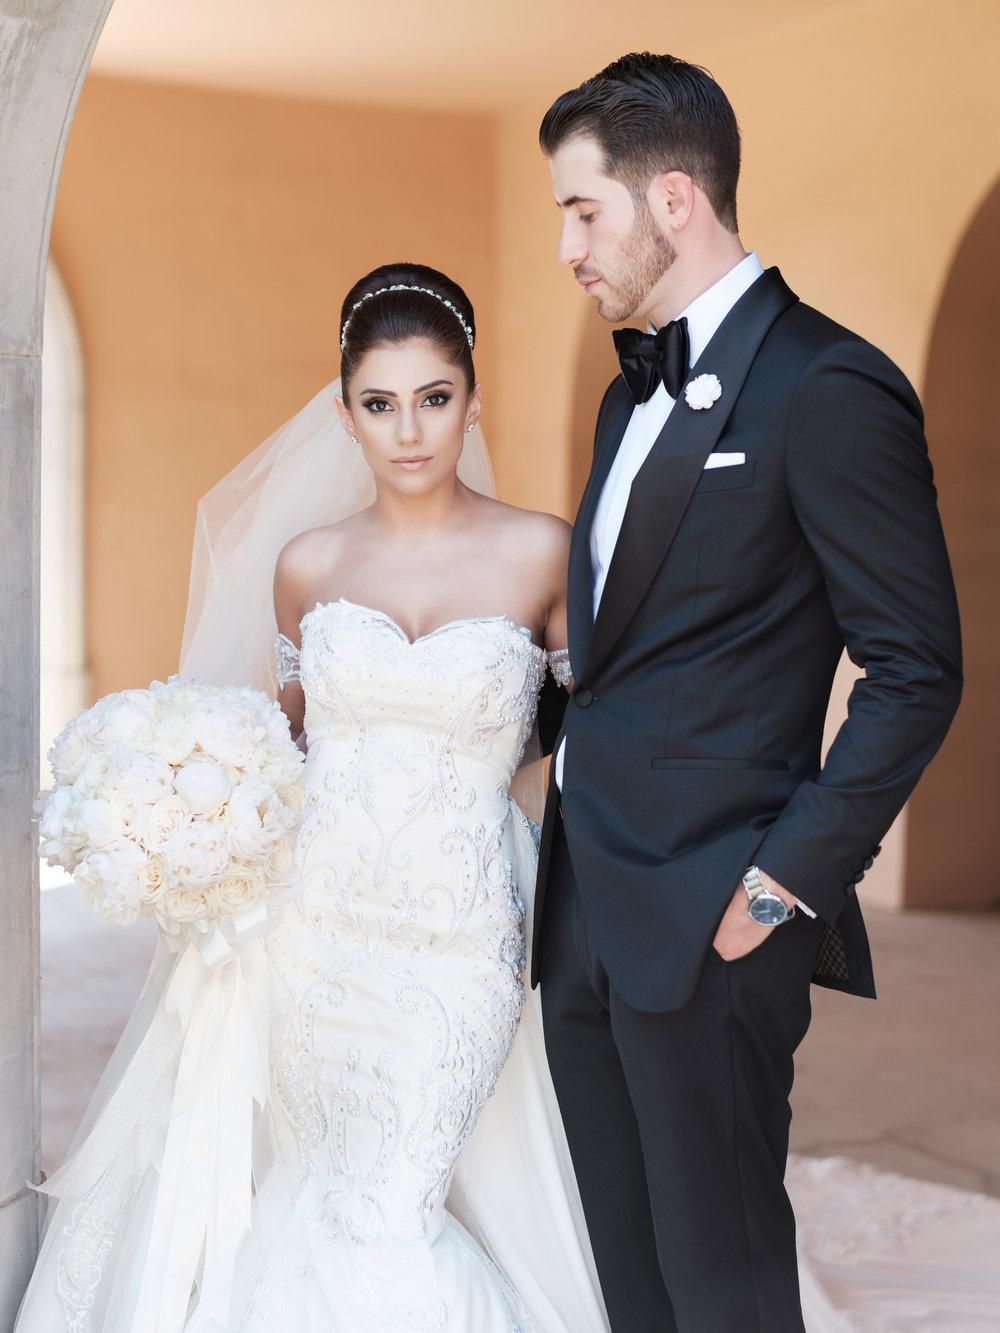 Bride at wedding in bridal gown in los angeles